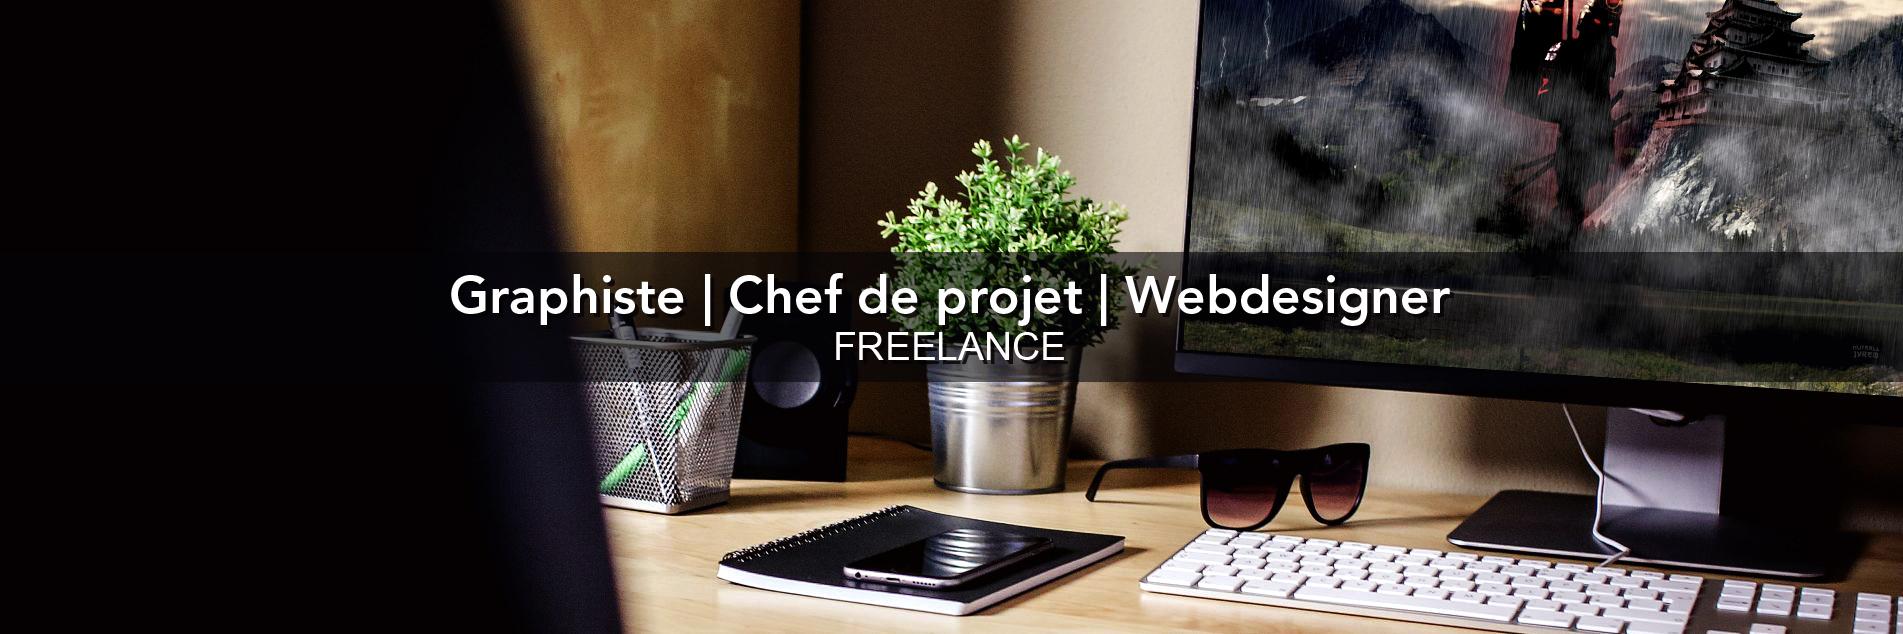 Jérémy Provenzano | Graphiste Webdesigner freelance marseille